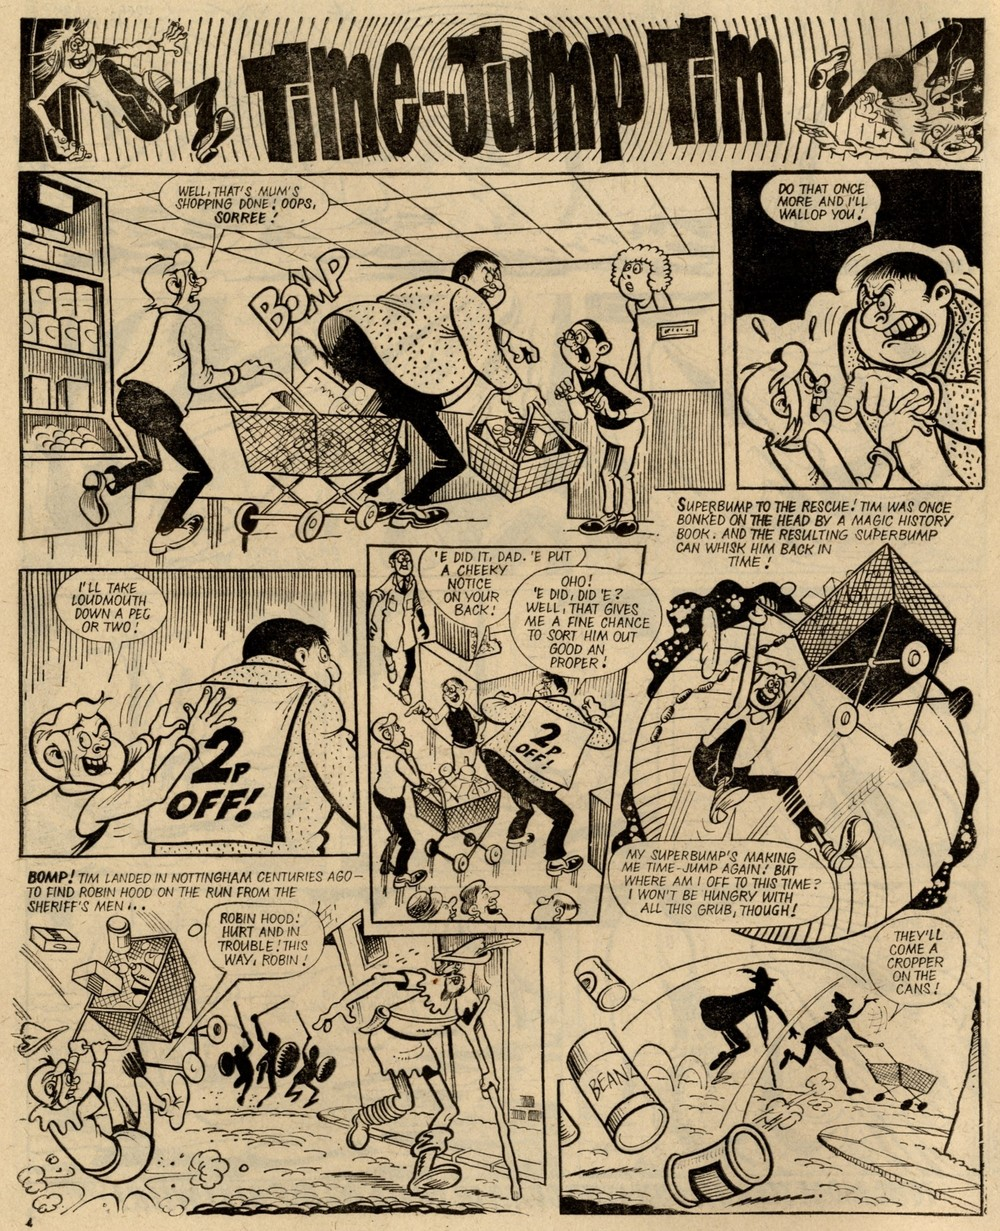 Time-jump Tim: Barrie Appleby (artist)